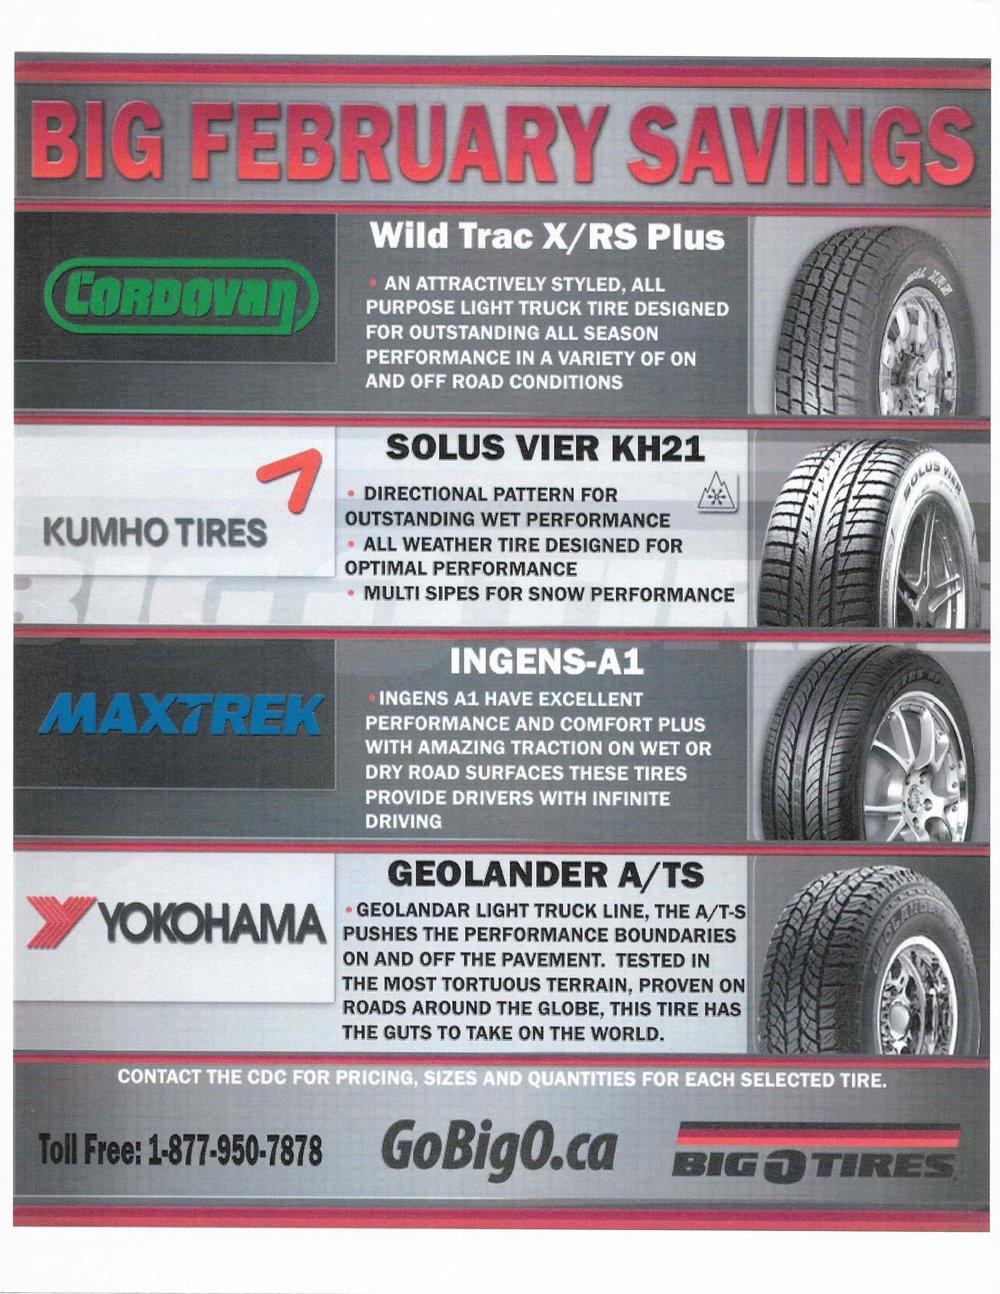 Big-O-Tires 19.jpg